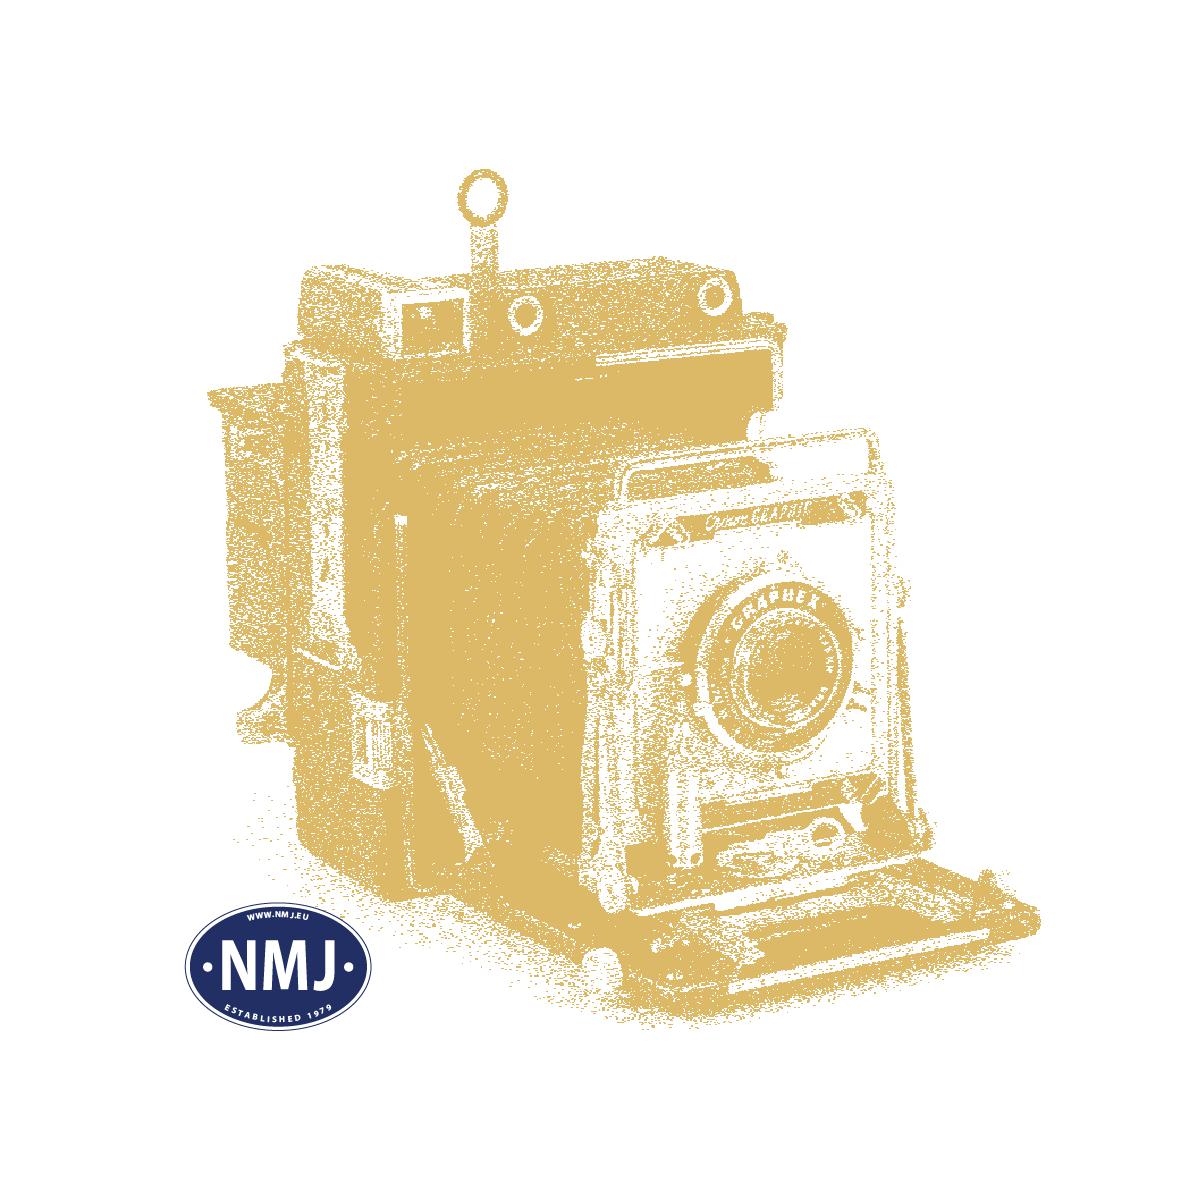 WODFS626 - Mellomgrønt Statisk Gress, 12mm, 28g